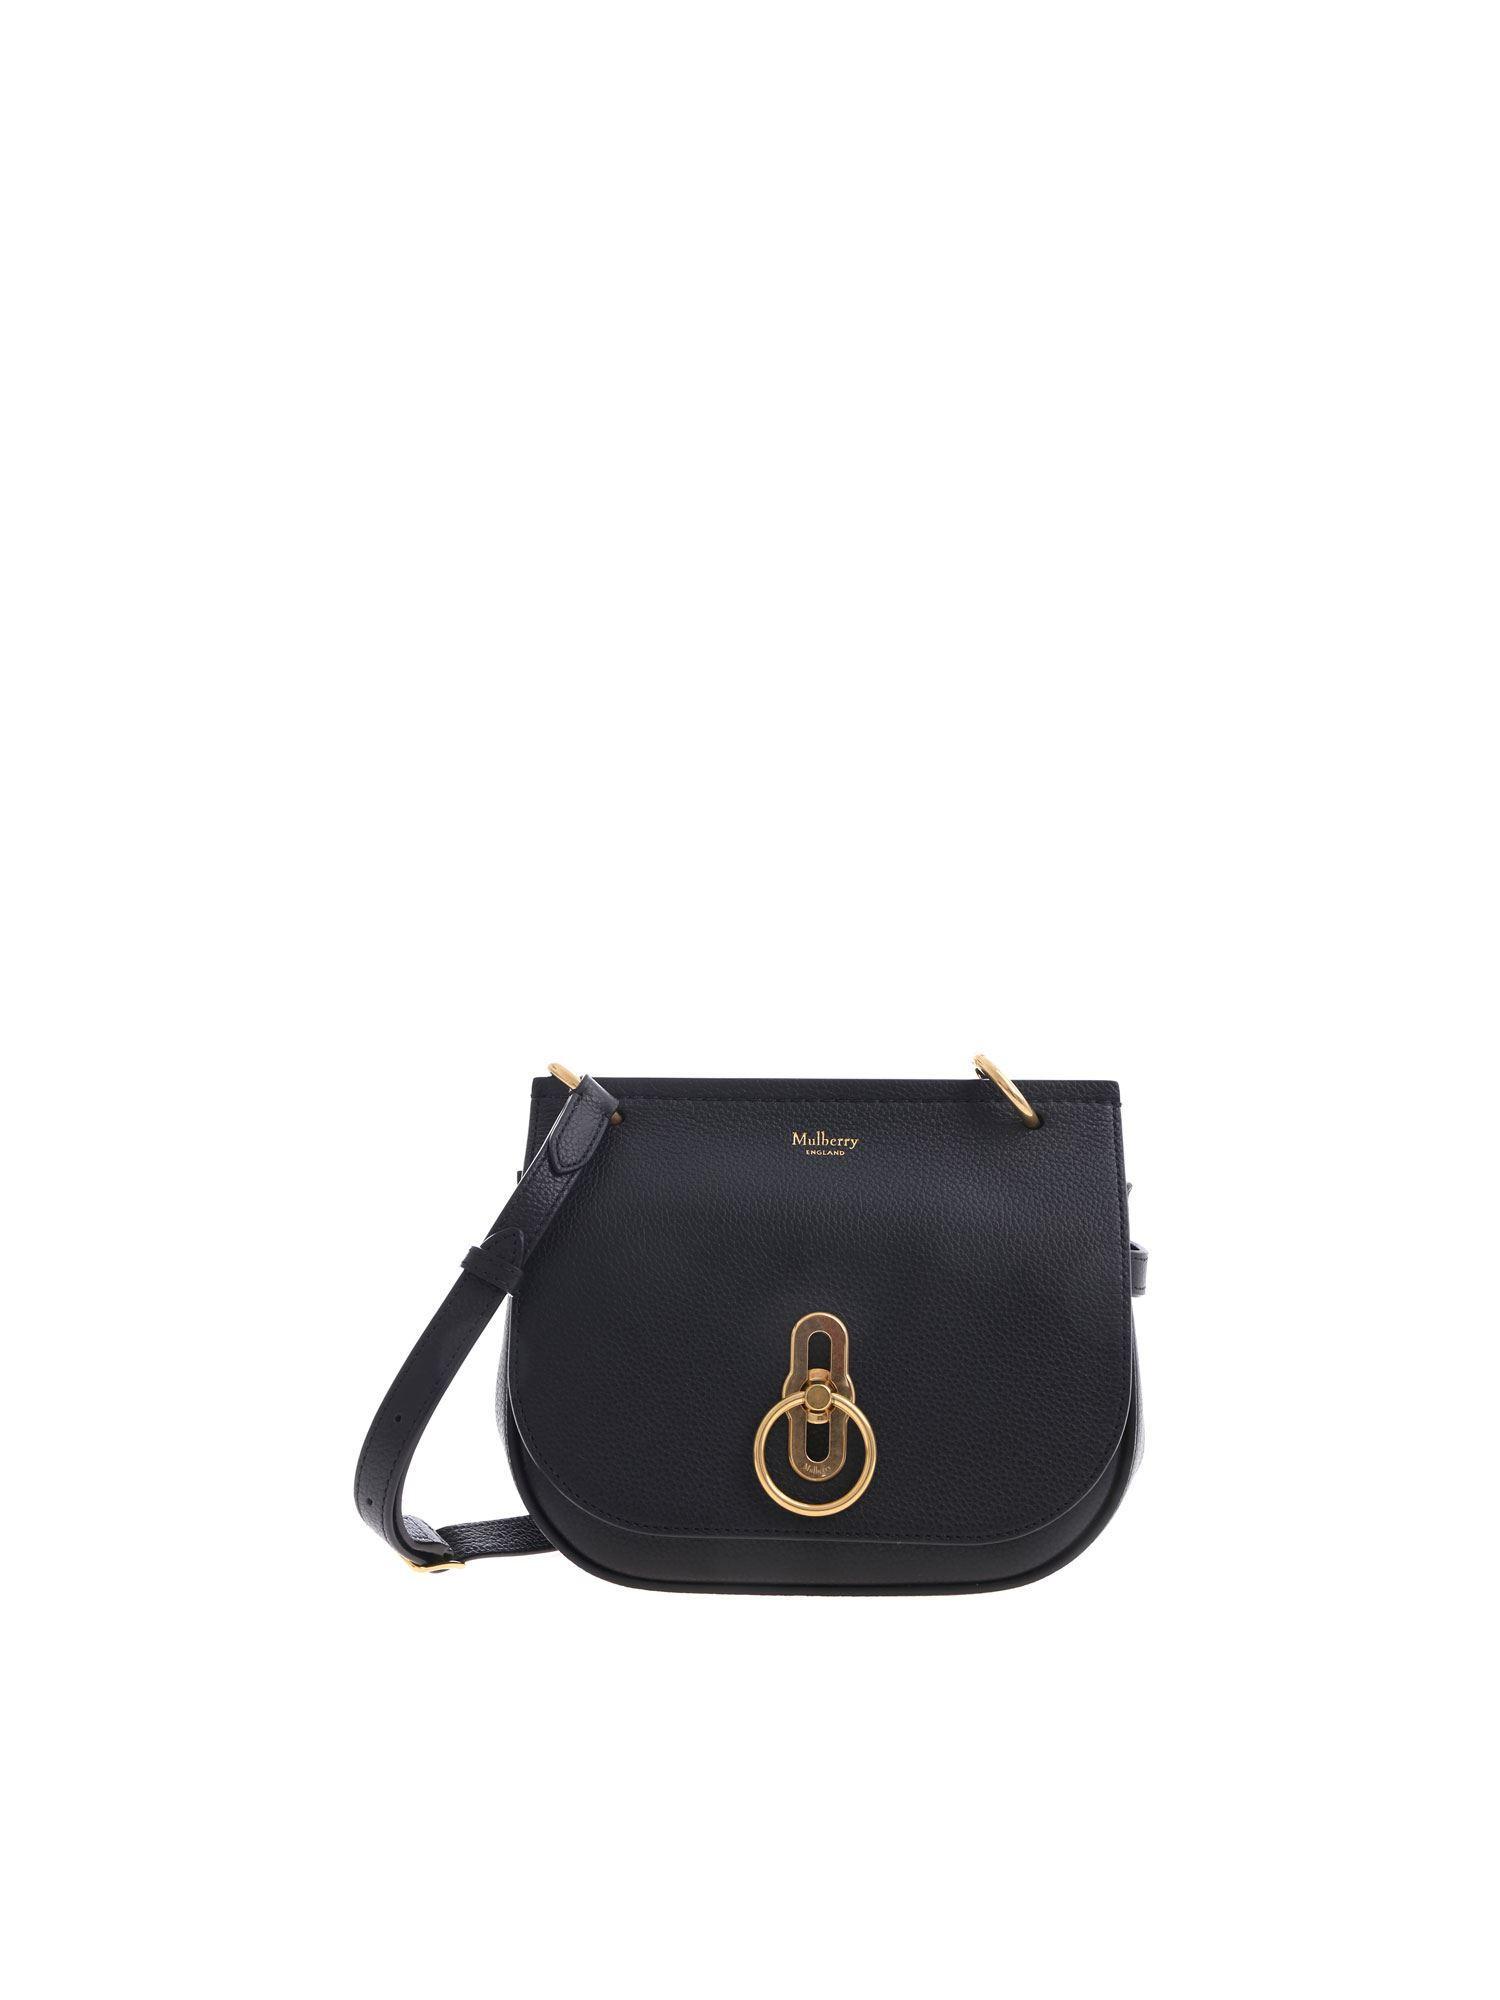 9665c051ec Mulberry - Amberley Satchel Small Black Bag - Lyst. View fullscreen